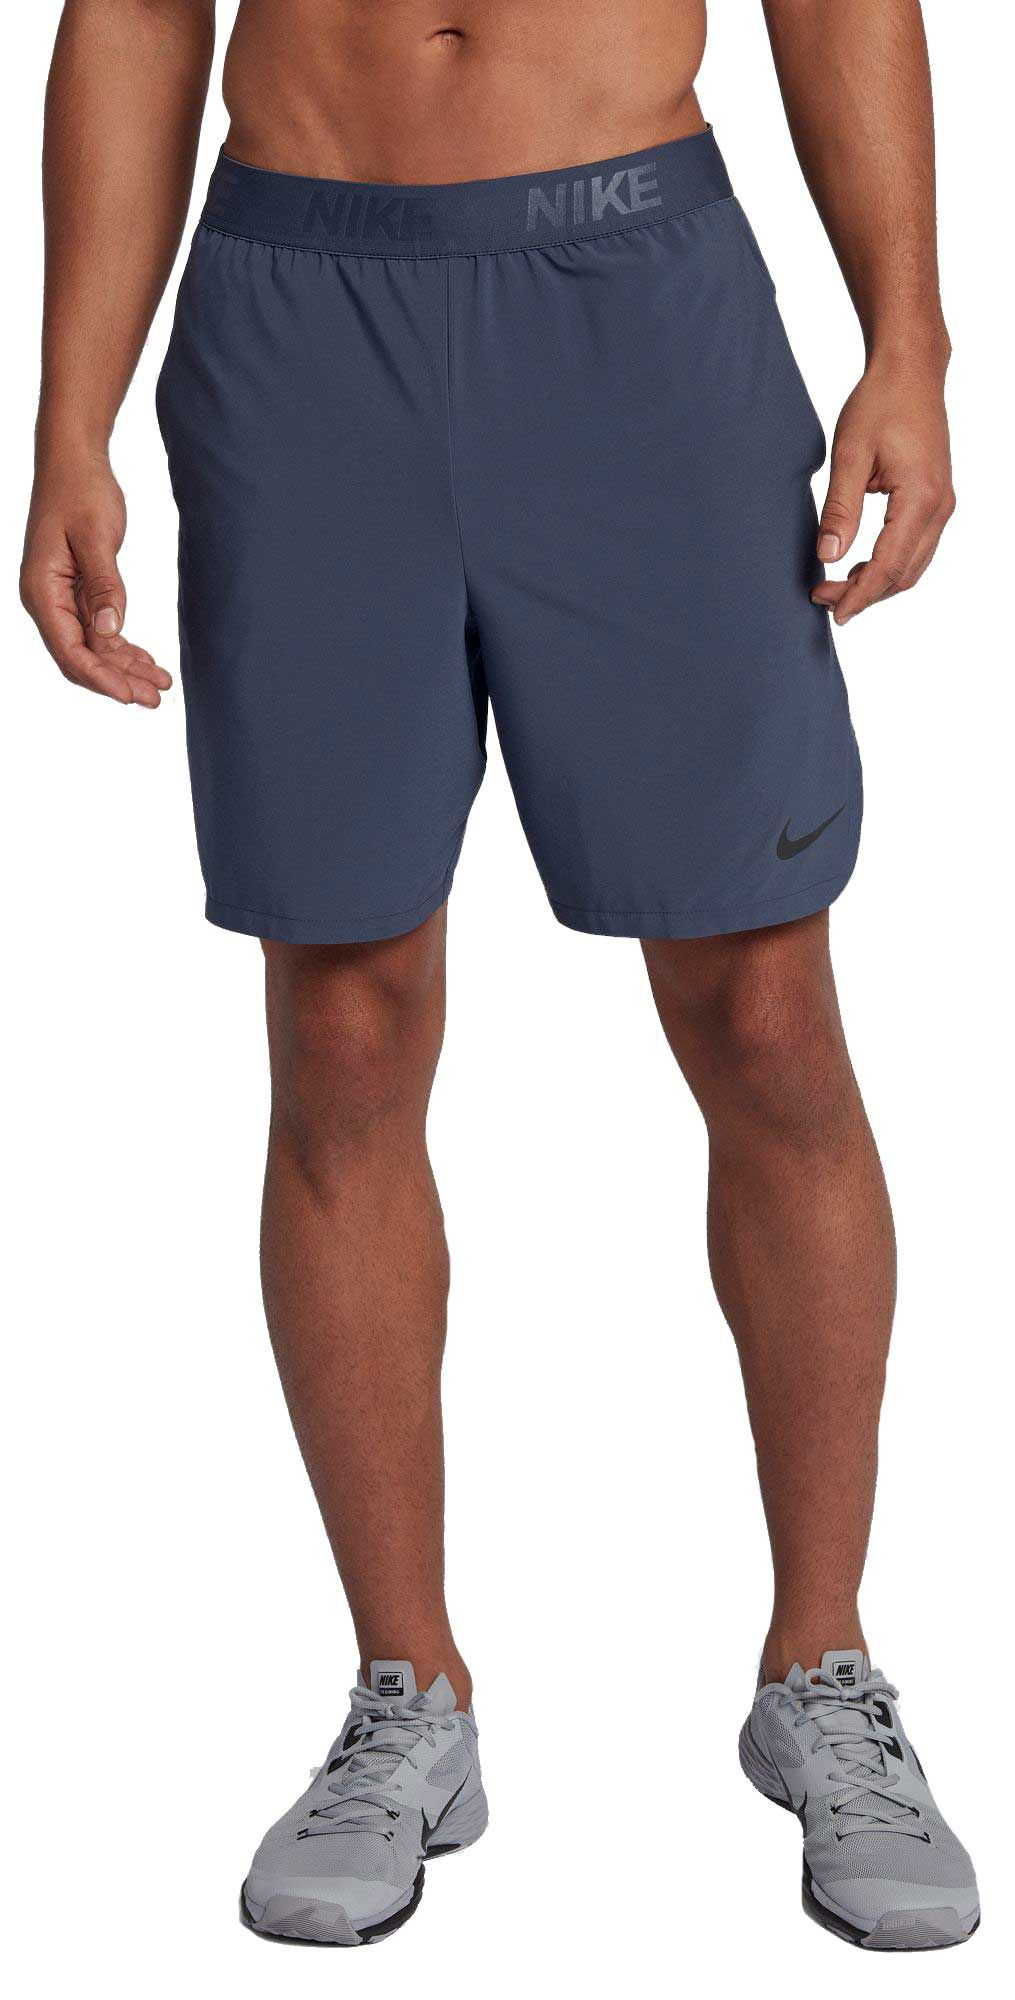 Dental exceso Activo  Nike - Nike Men's Flex Vent Max 2.0 Training Shorts - Walmart.com -  Walmart.com